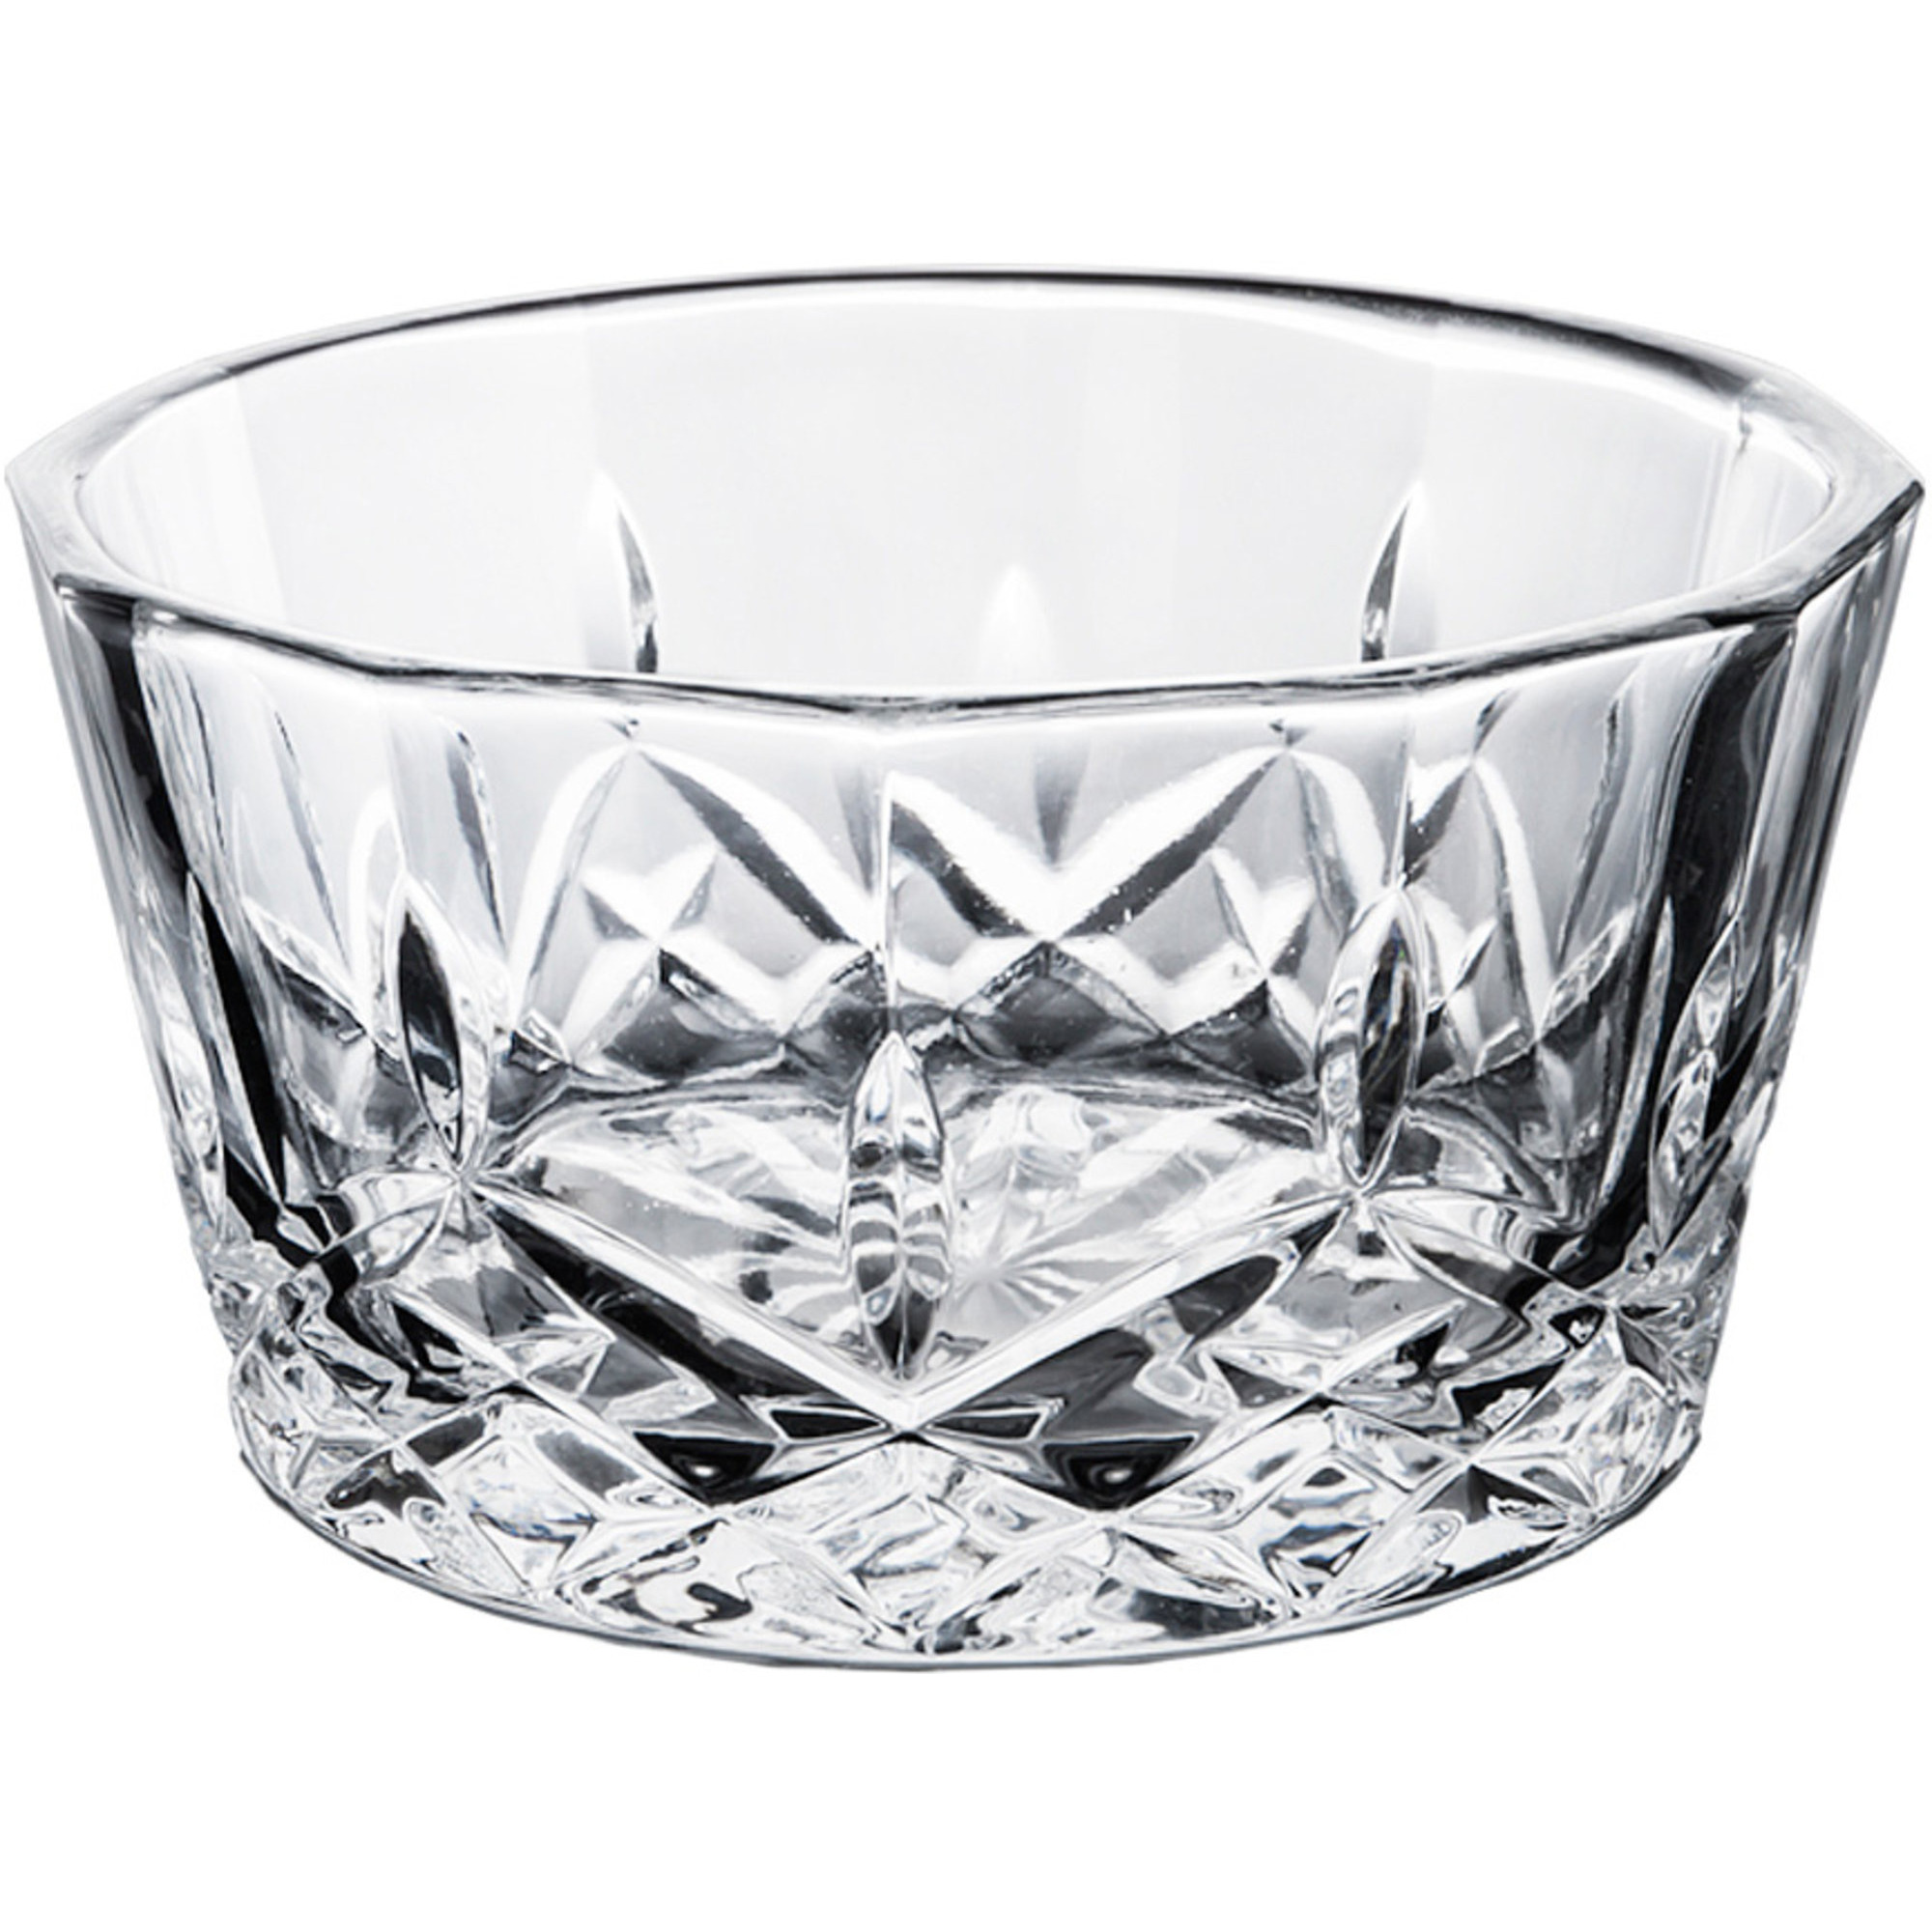 Aida Harvey Snacksskål Glas 11,5 cm Klar 4 st